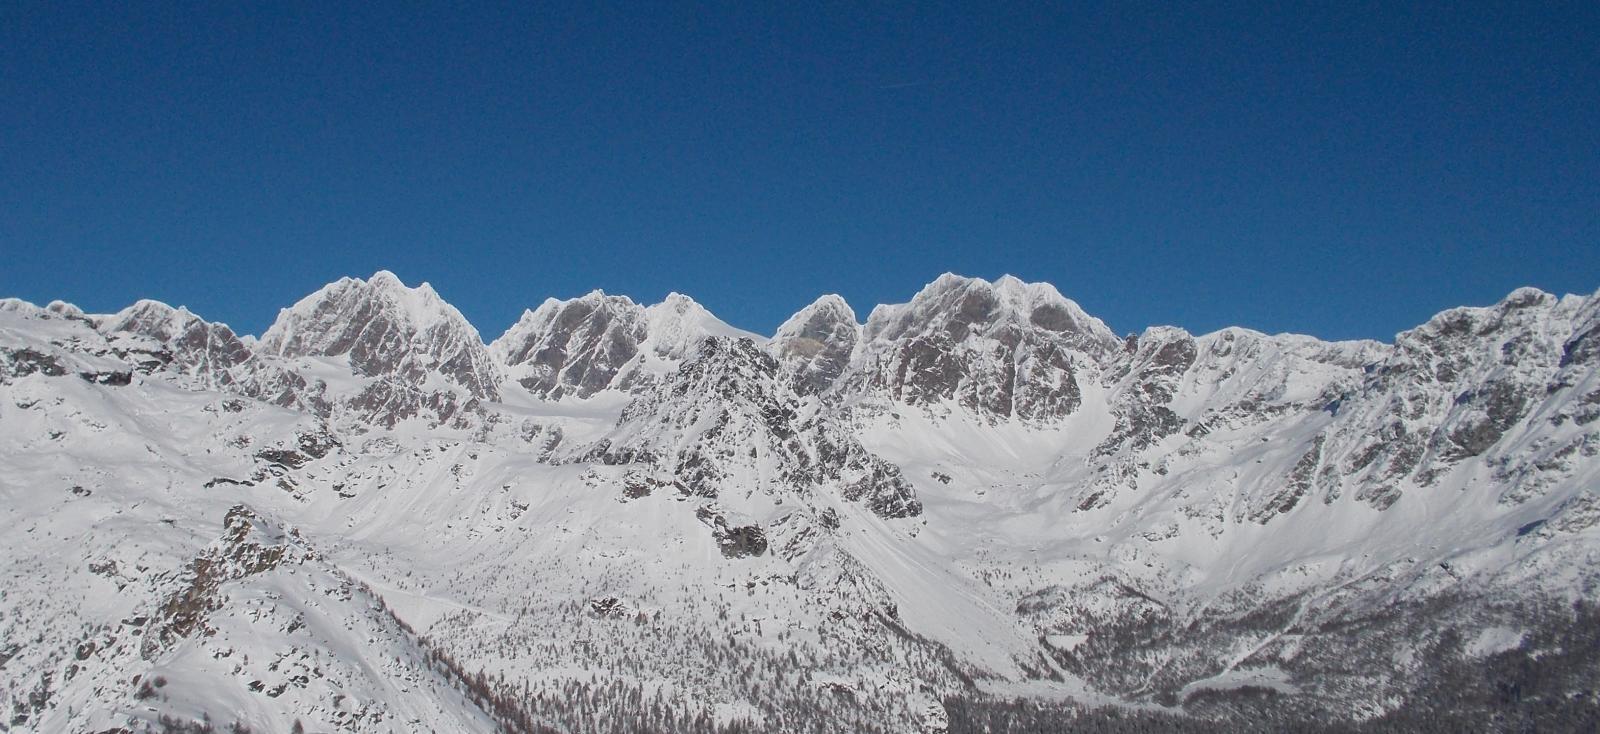 Gruppo del Bernina dal Monte Motta